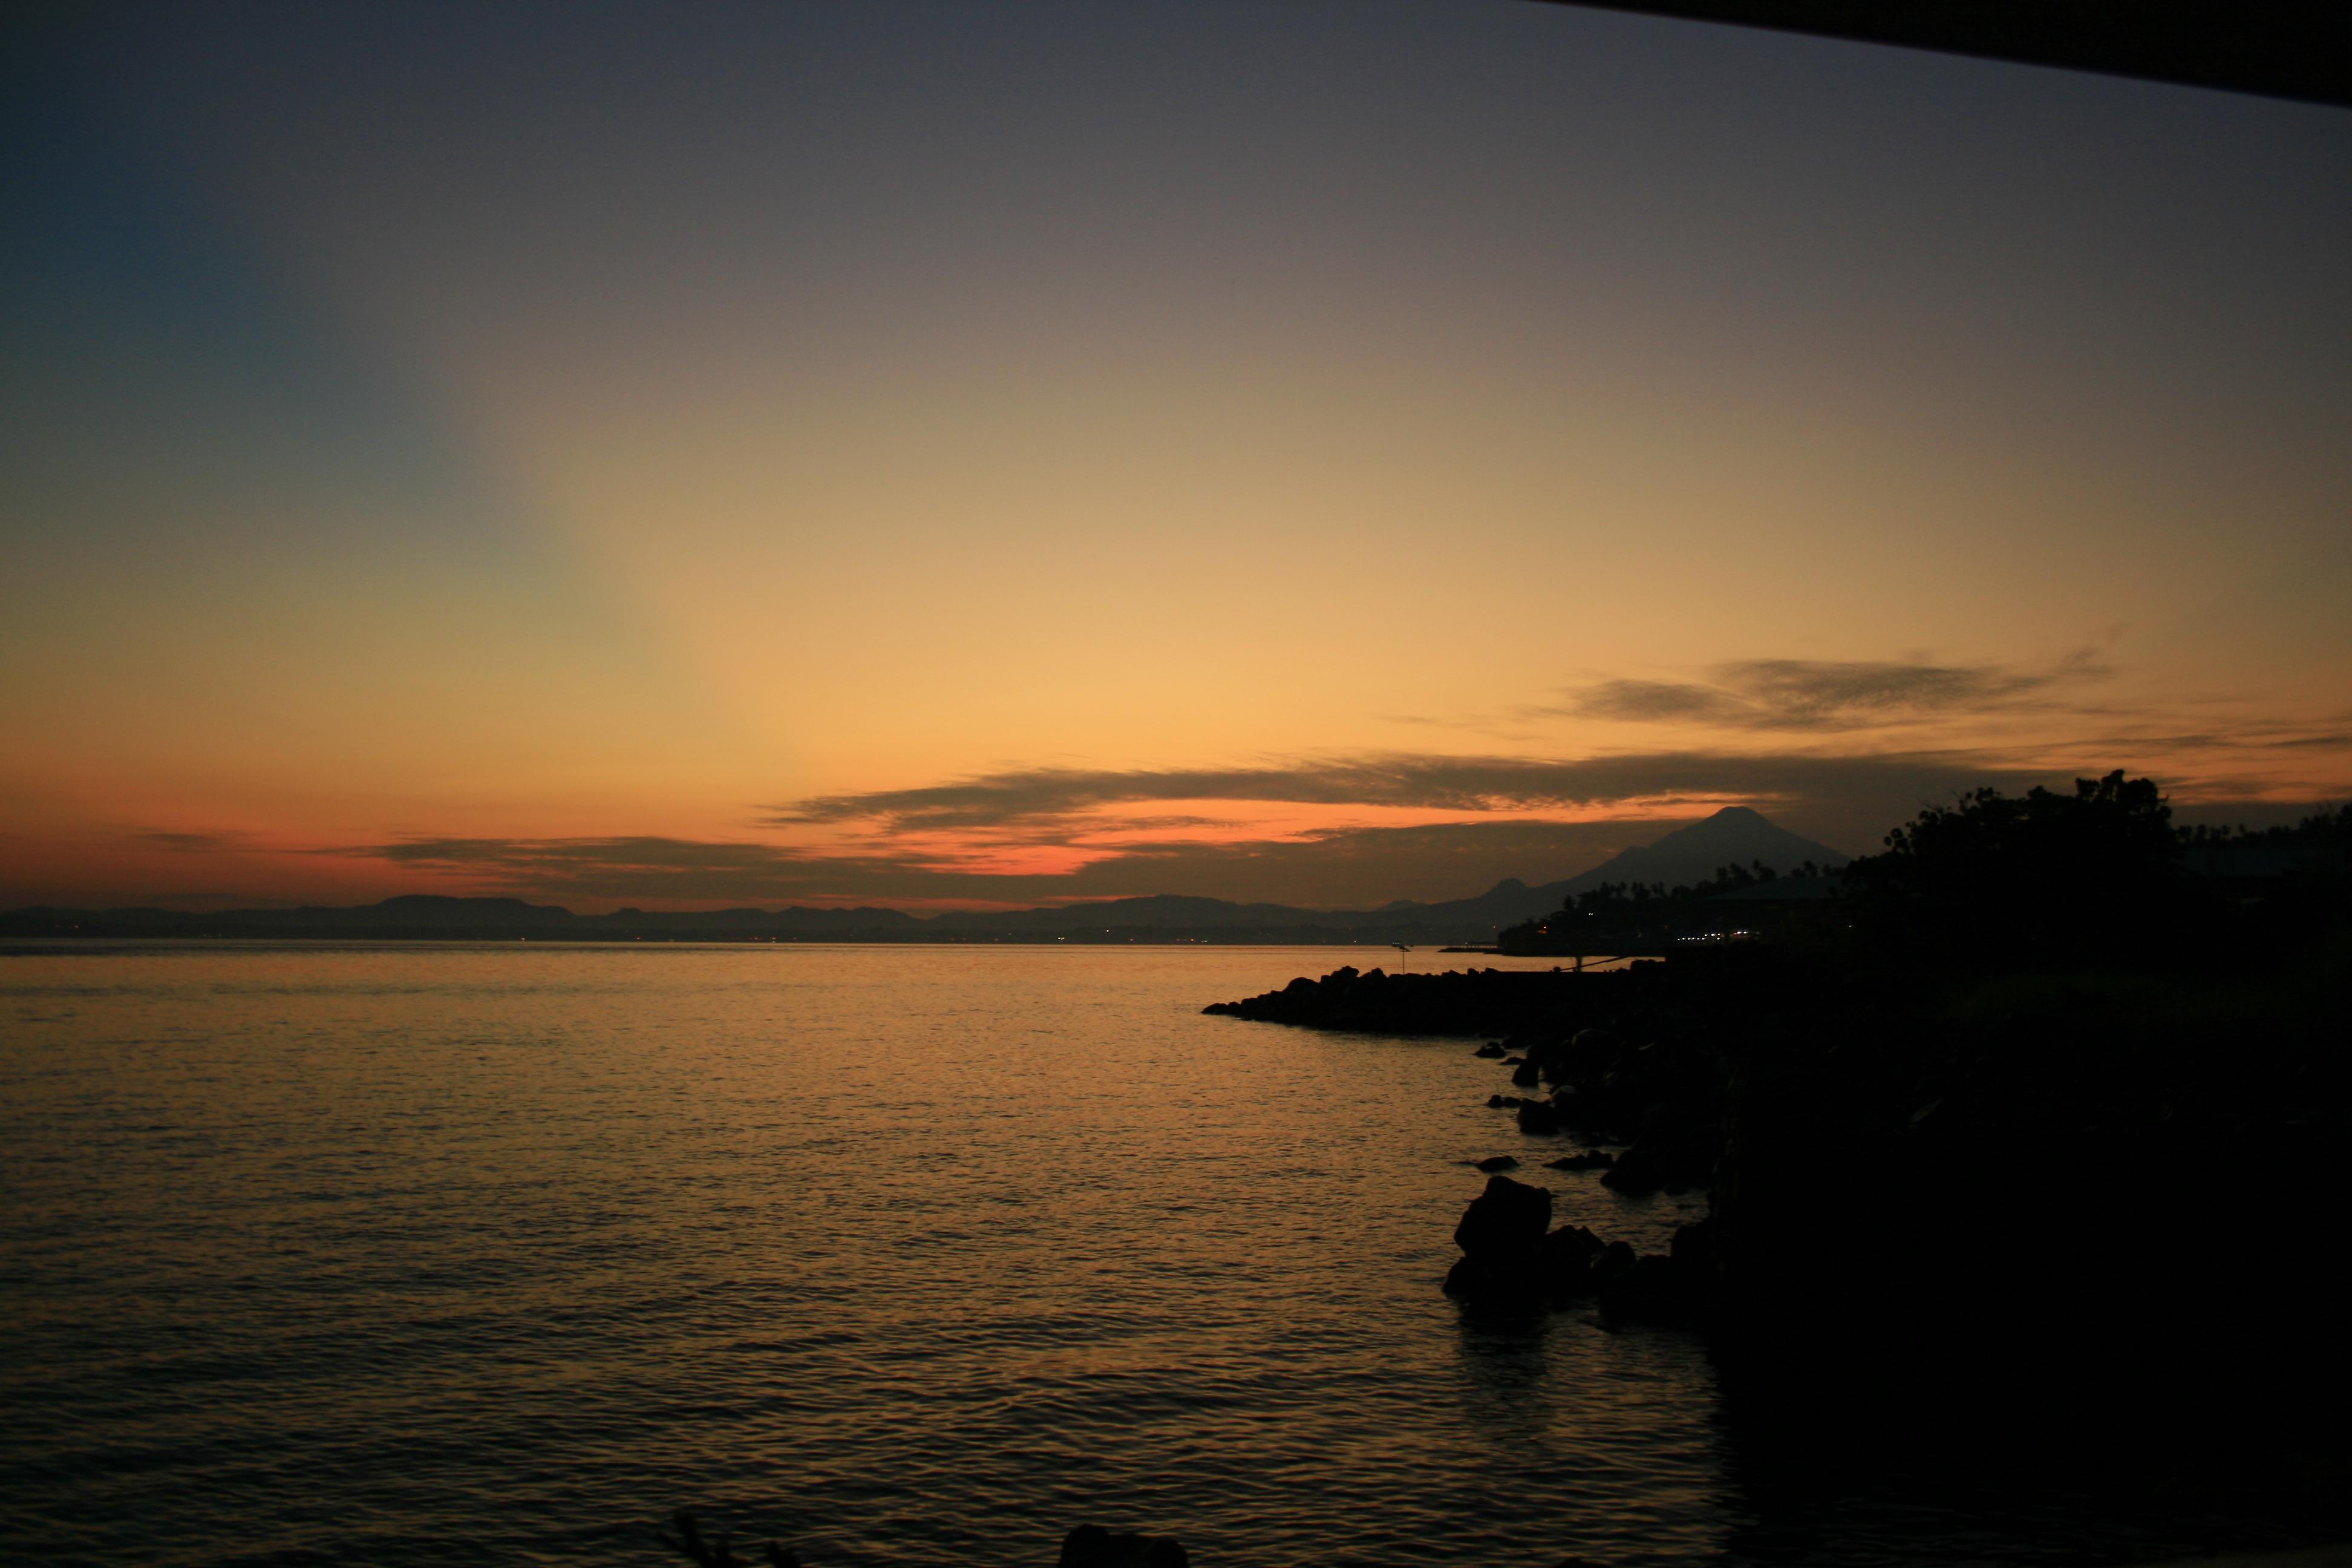 Pantai Malalayang Kota Manado Nyaman Damai Sunset Terletak Ujung Selatan